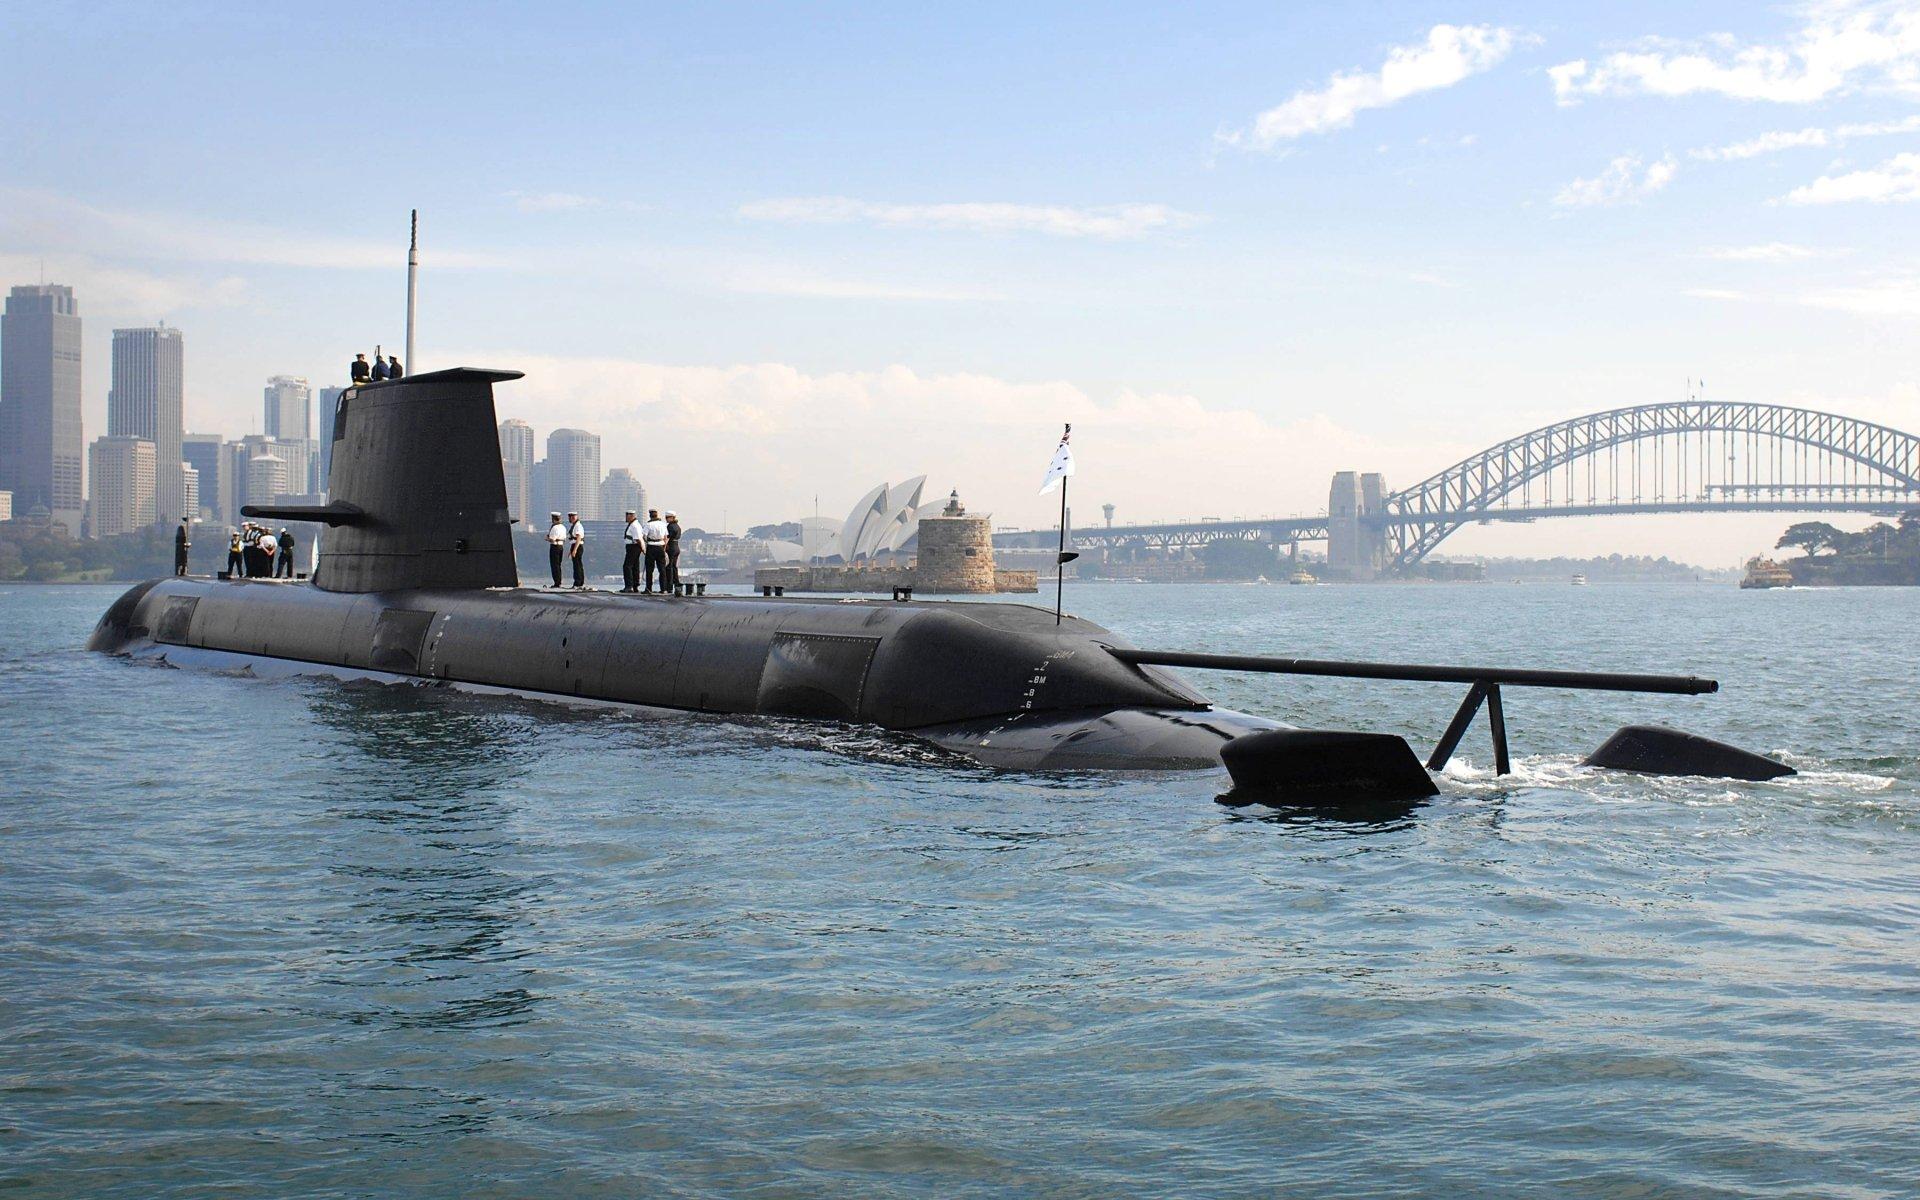 Military - Submarine  Sydney Harbour Sydney Harbour Bridge Wallpaper